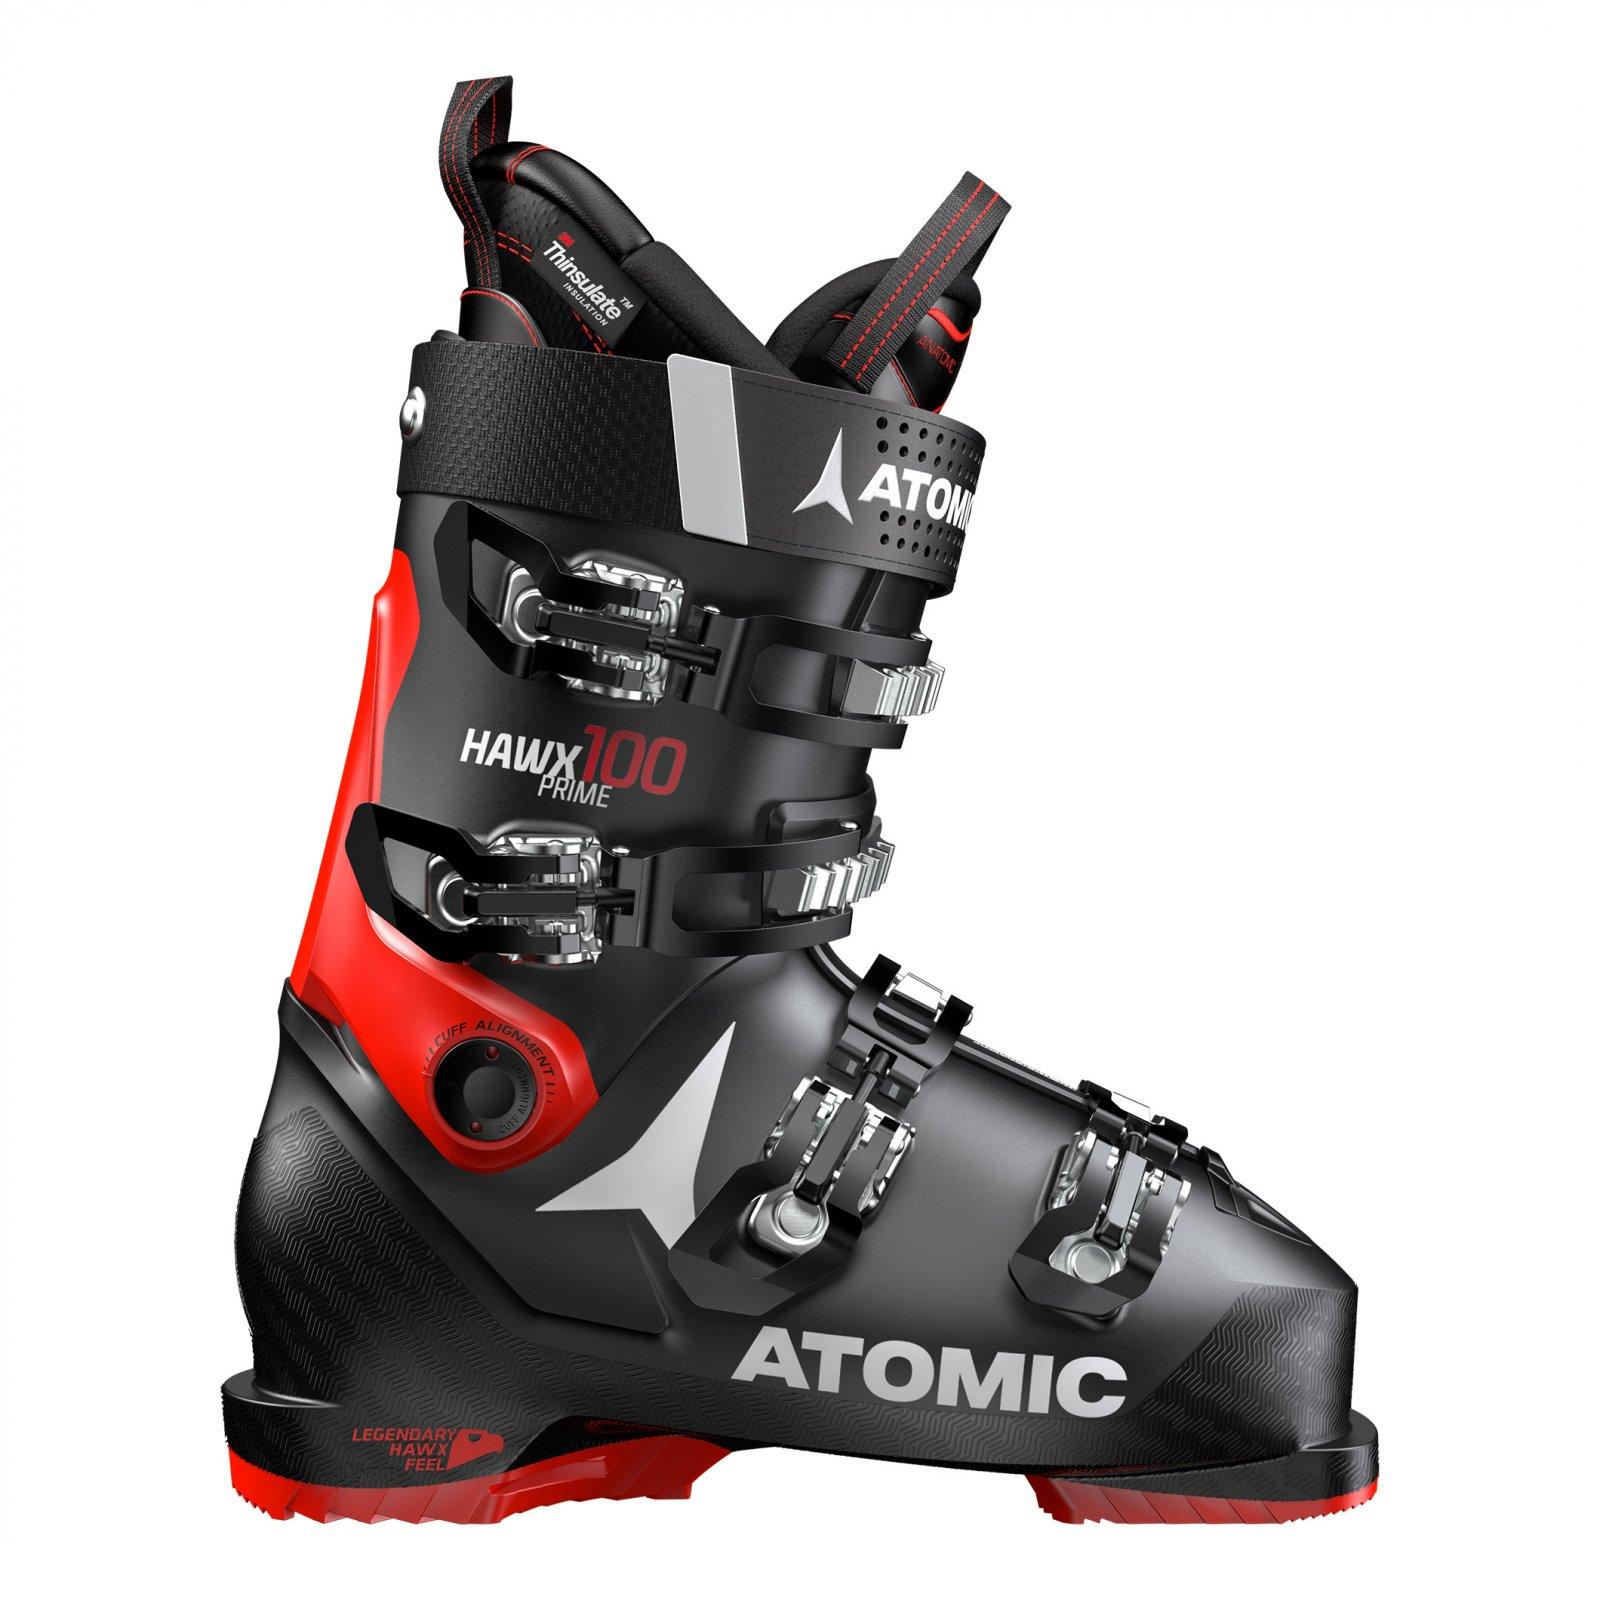 2020 Atomic Hawx Prime 100 Men's Ski Boots